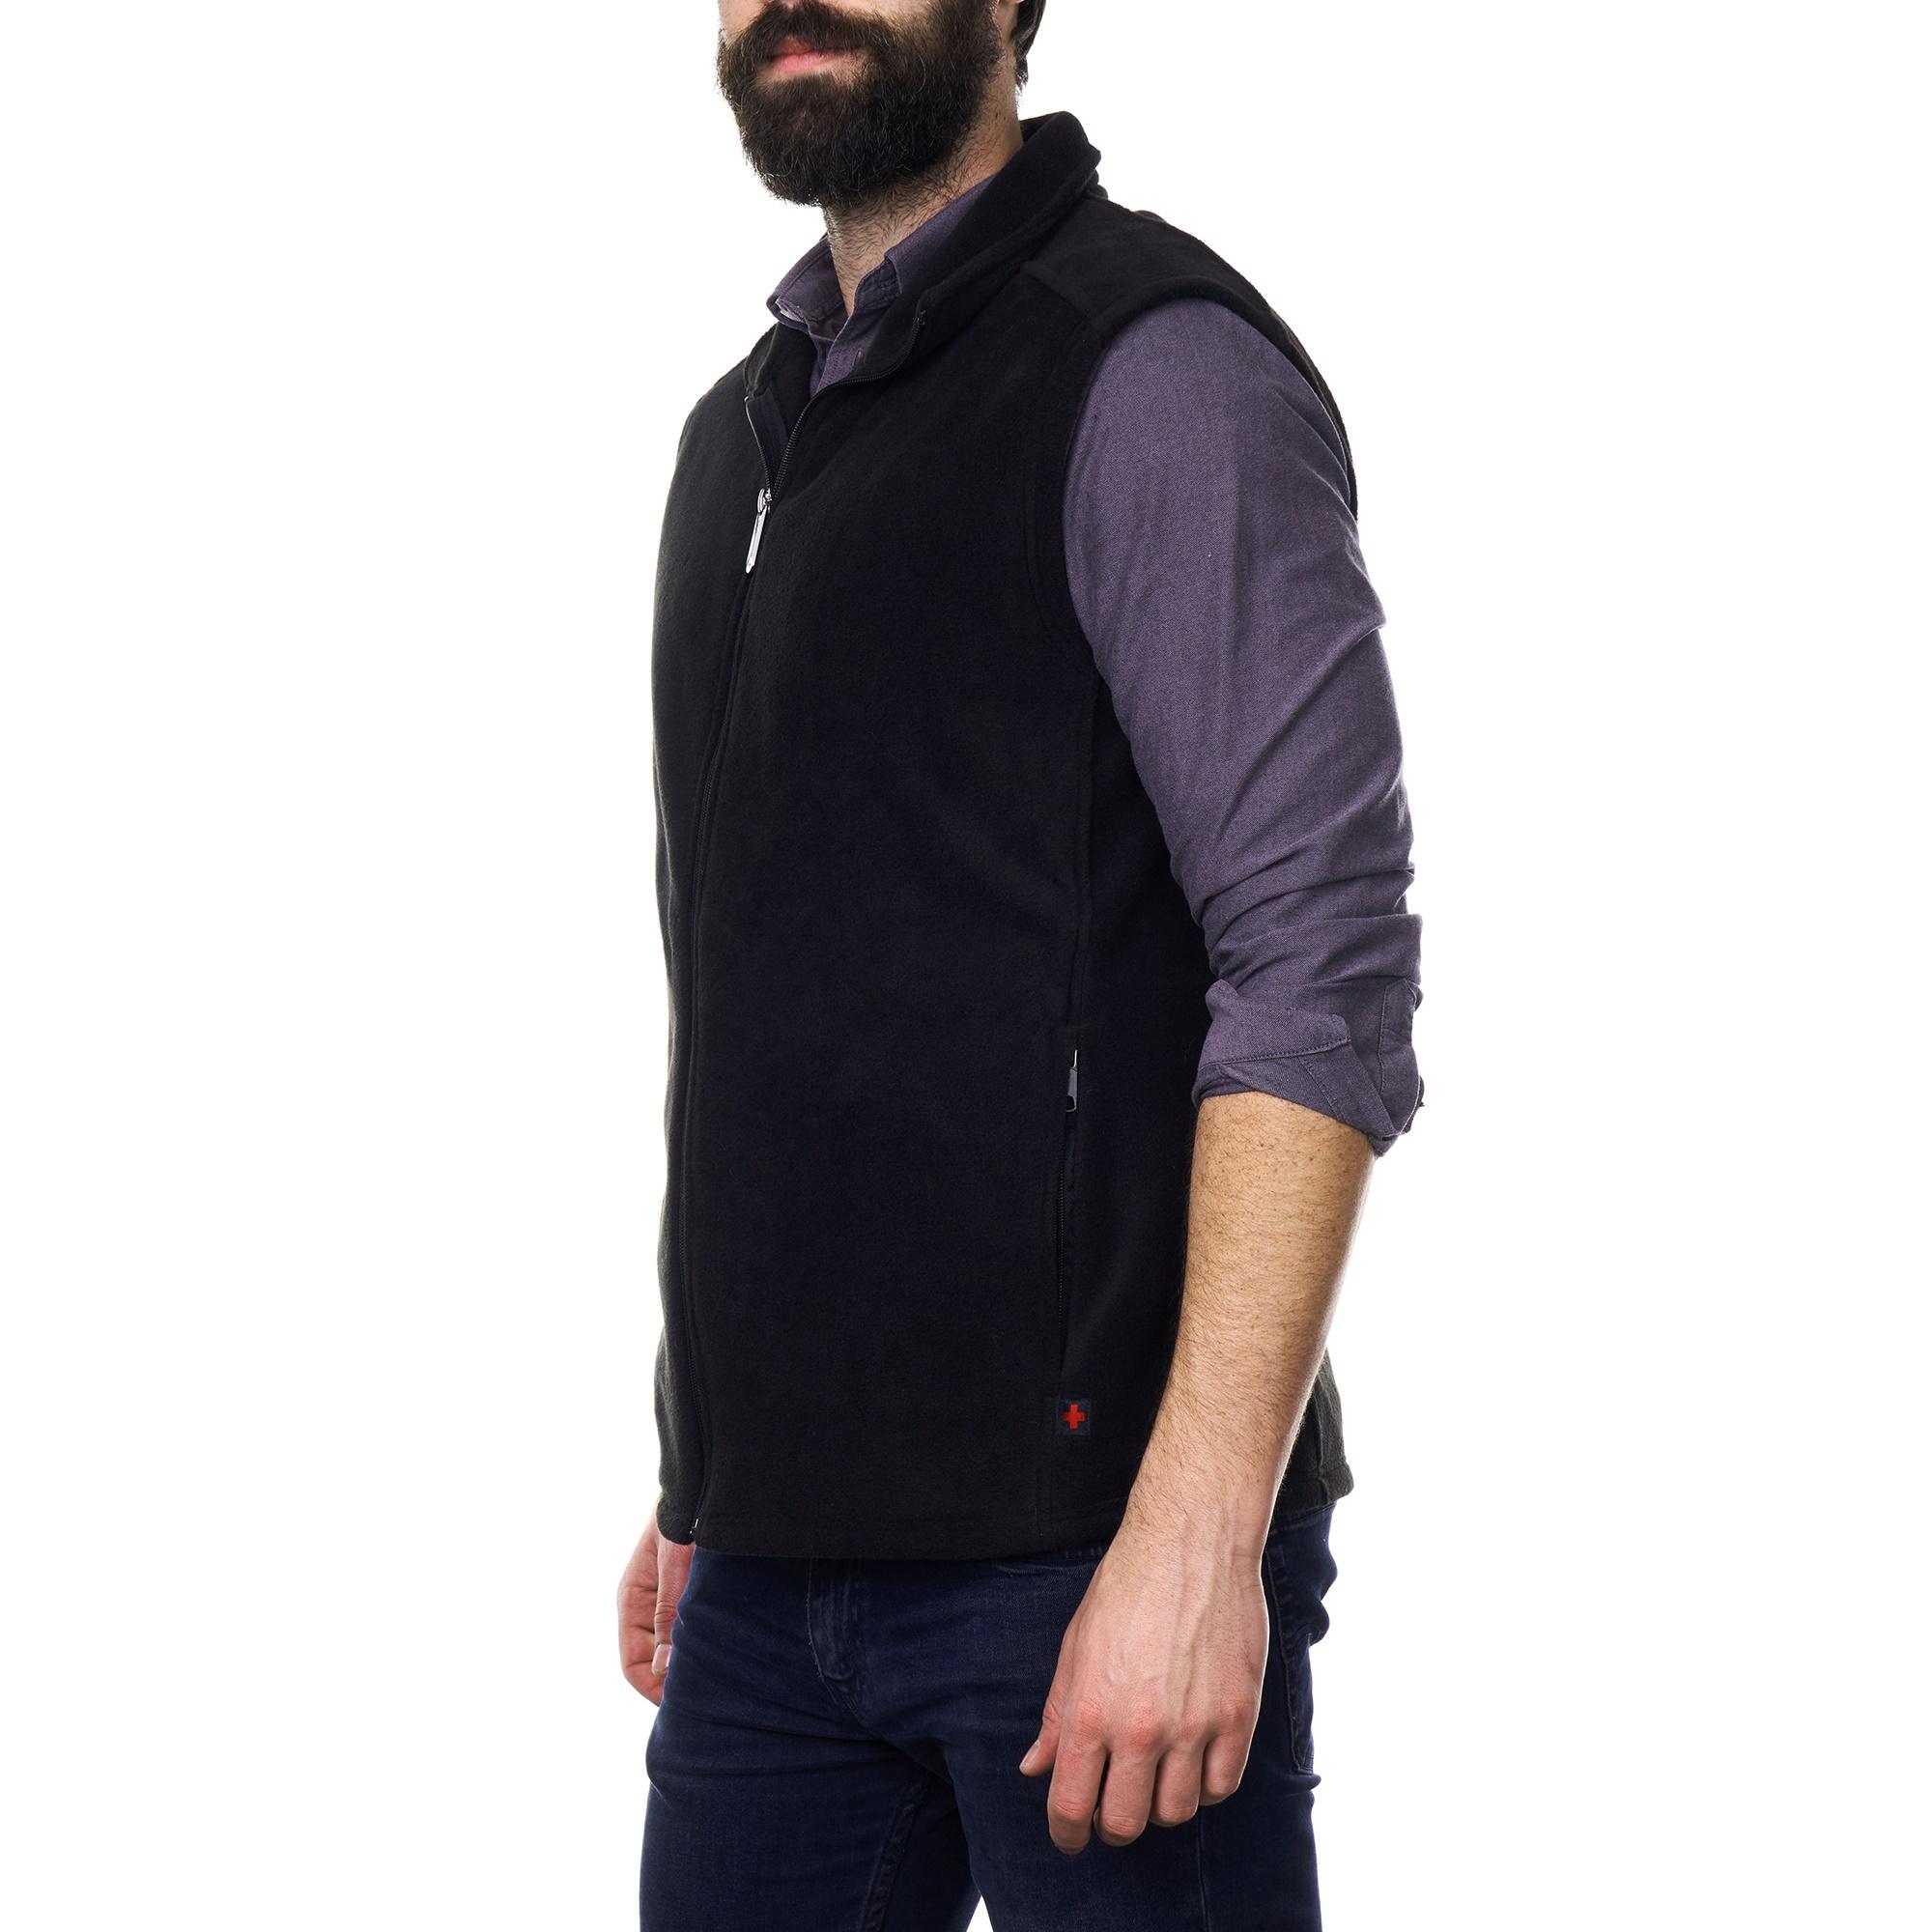 Alpine-Swiss-Mens-Full-Zip-Up-Fleece-Vest-Lightweight-Warm-Sleeveless-Jacket thumbnail 16